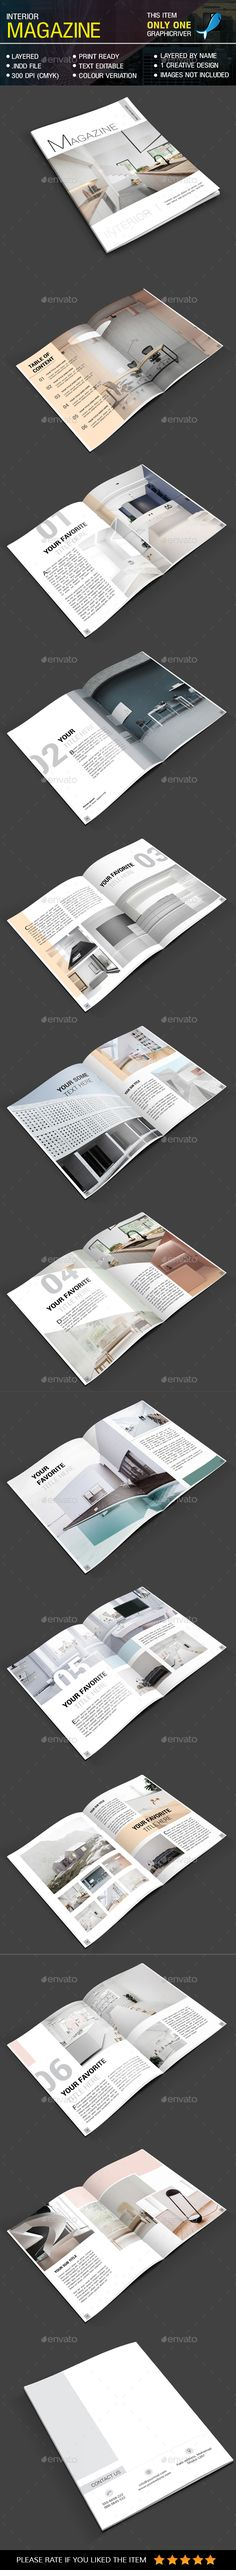 Minimal Interior Magazine - Magazines Print Templates Download here : https://graphicriver.net/item/minimal-interior-magazine/20683658?s_rank=1&ref=Al-fatih #magazine #magazine template #magazine layout #template #premium design #design grafis #layout #creative design #indesign magazine